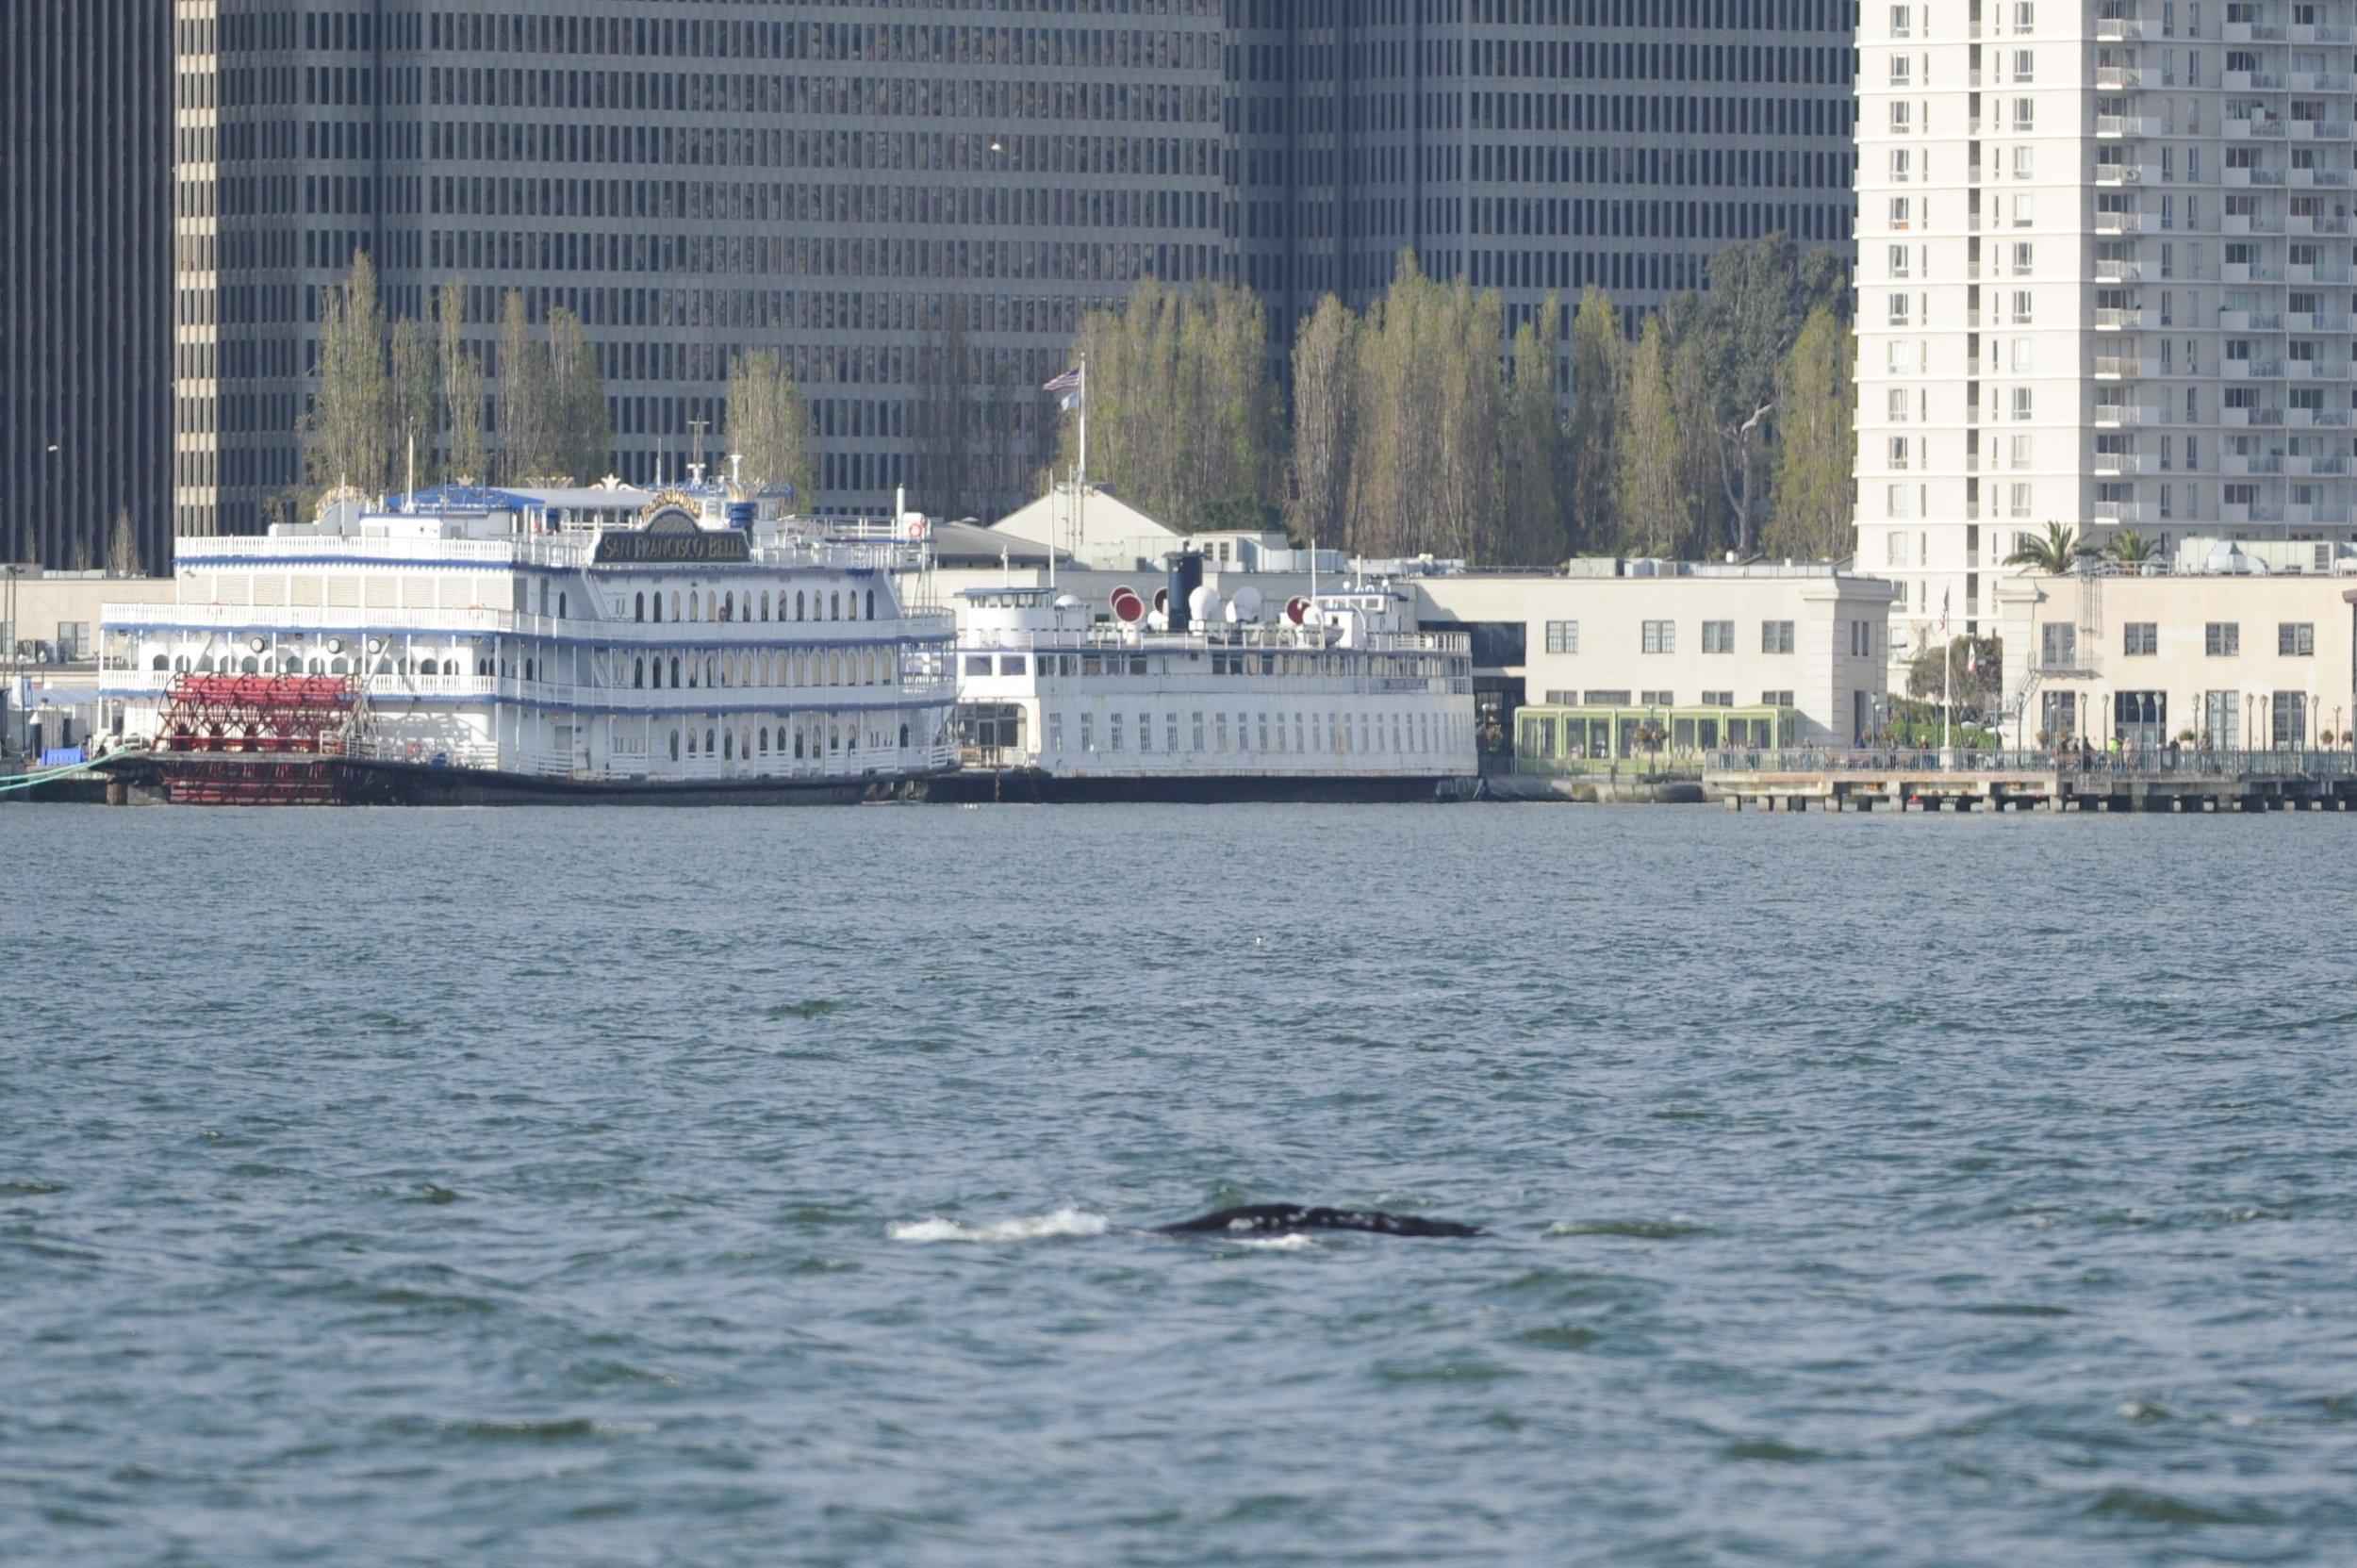 Gray whale surfaces near the Bay Bridge.